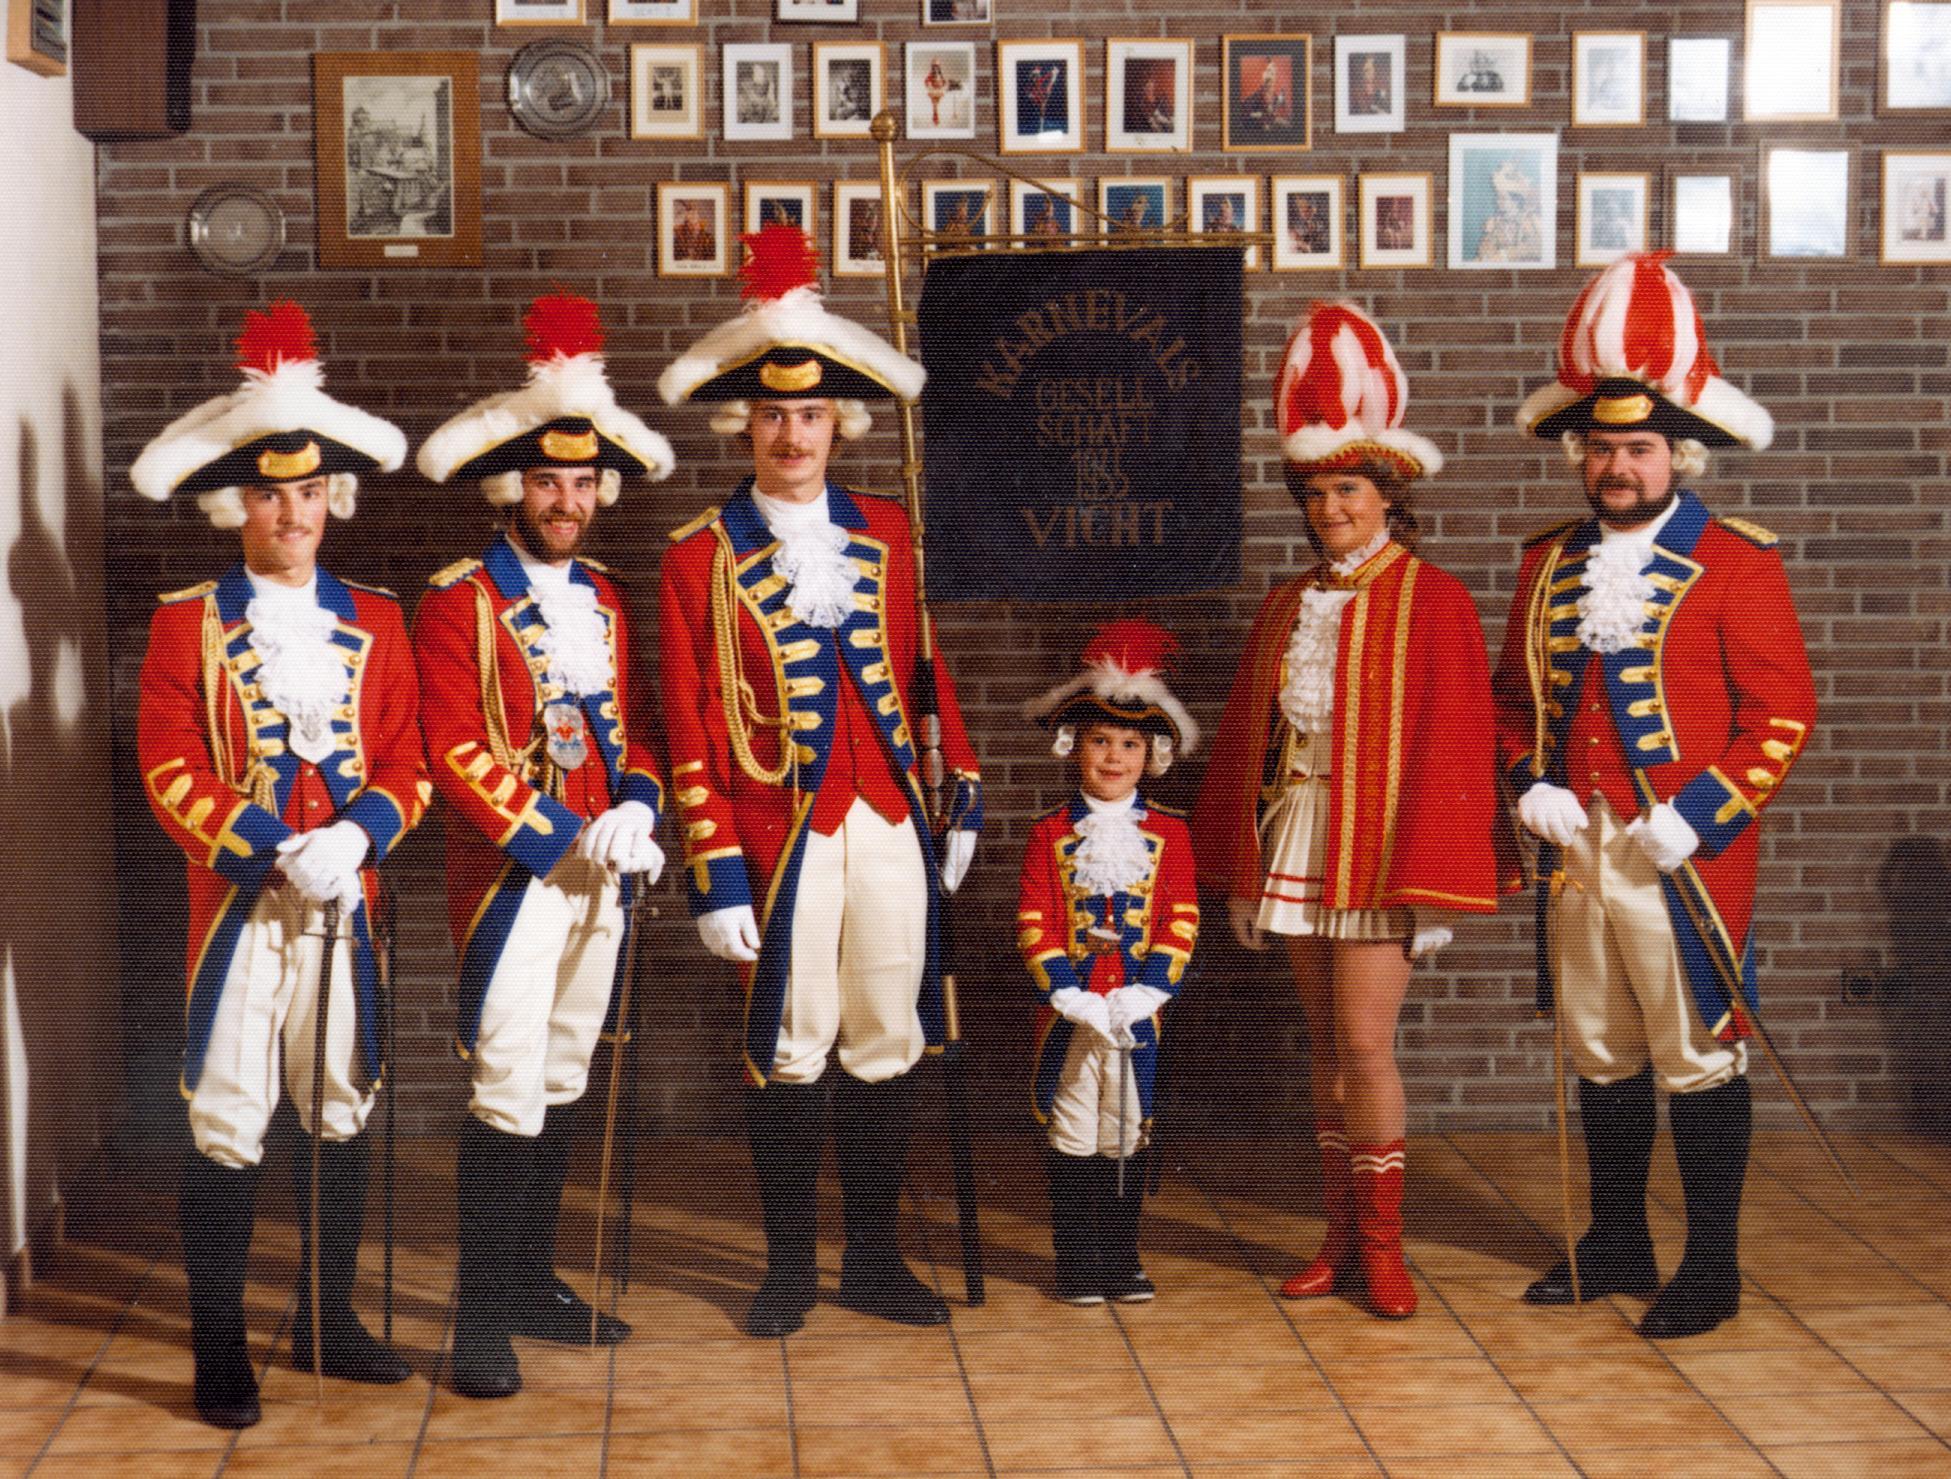 Prinzengarde der KG Vicht, Karneval